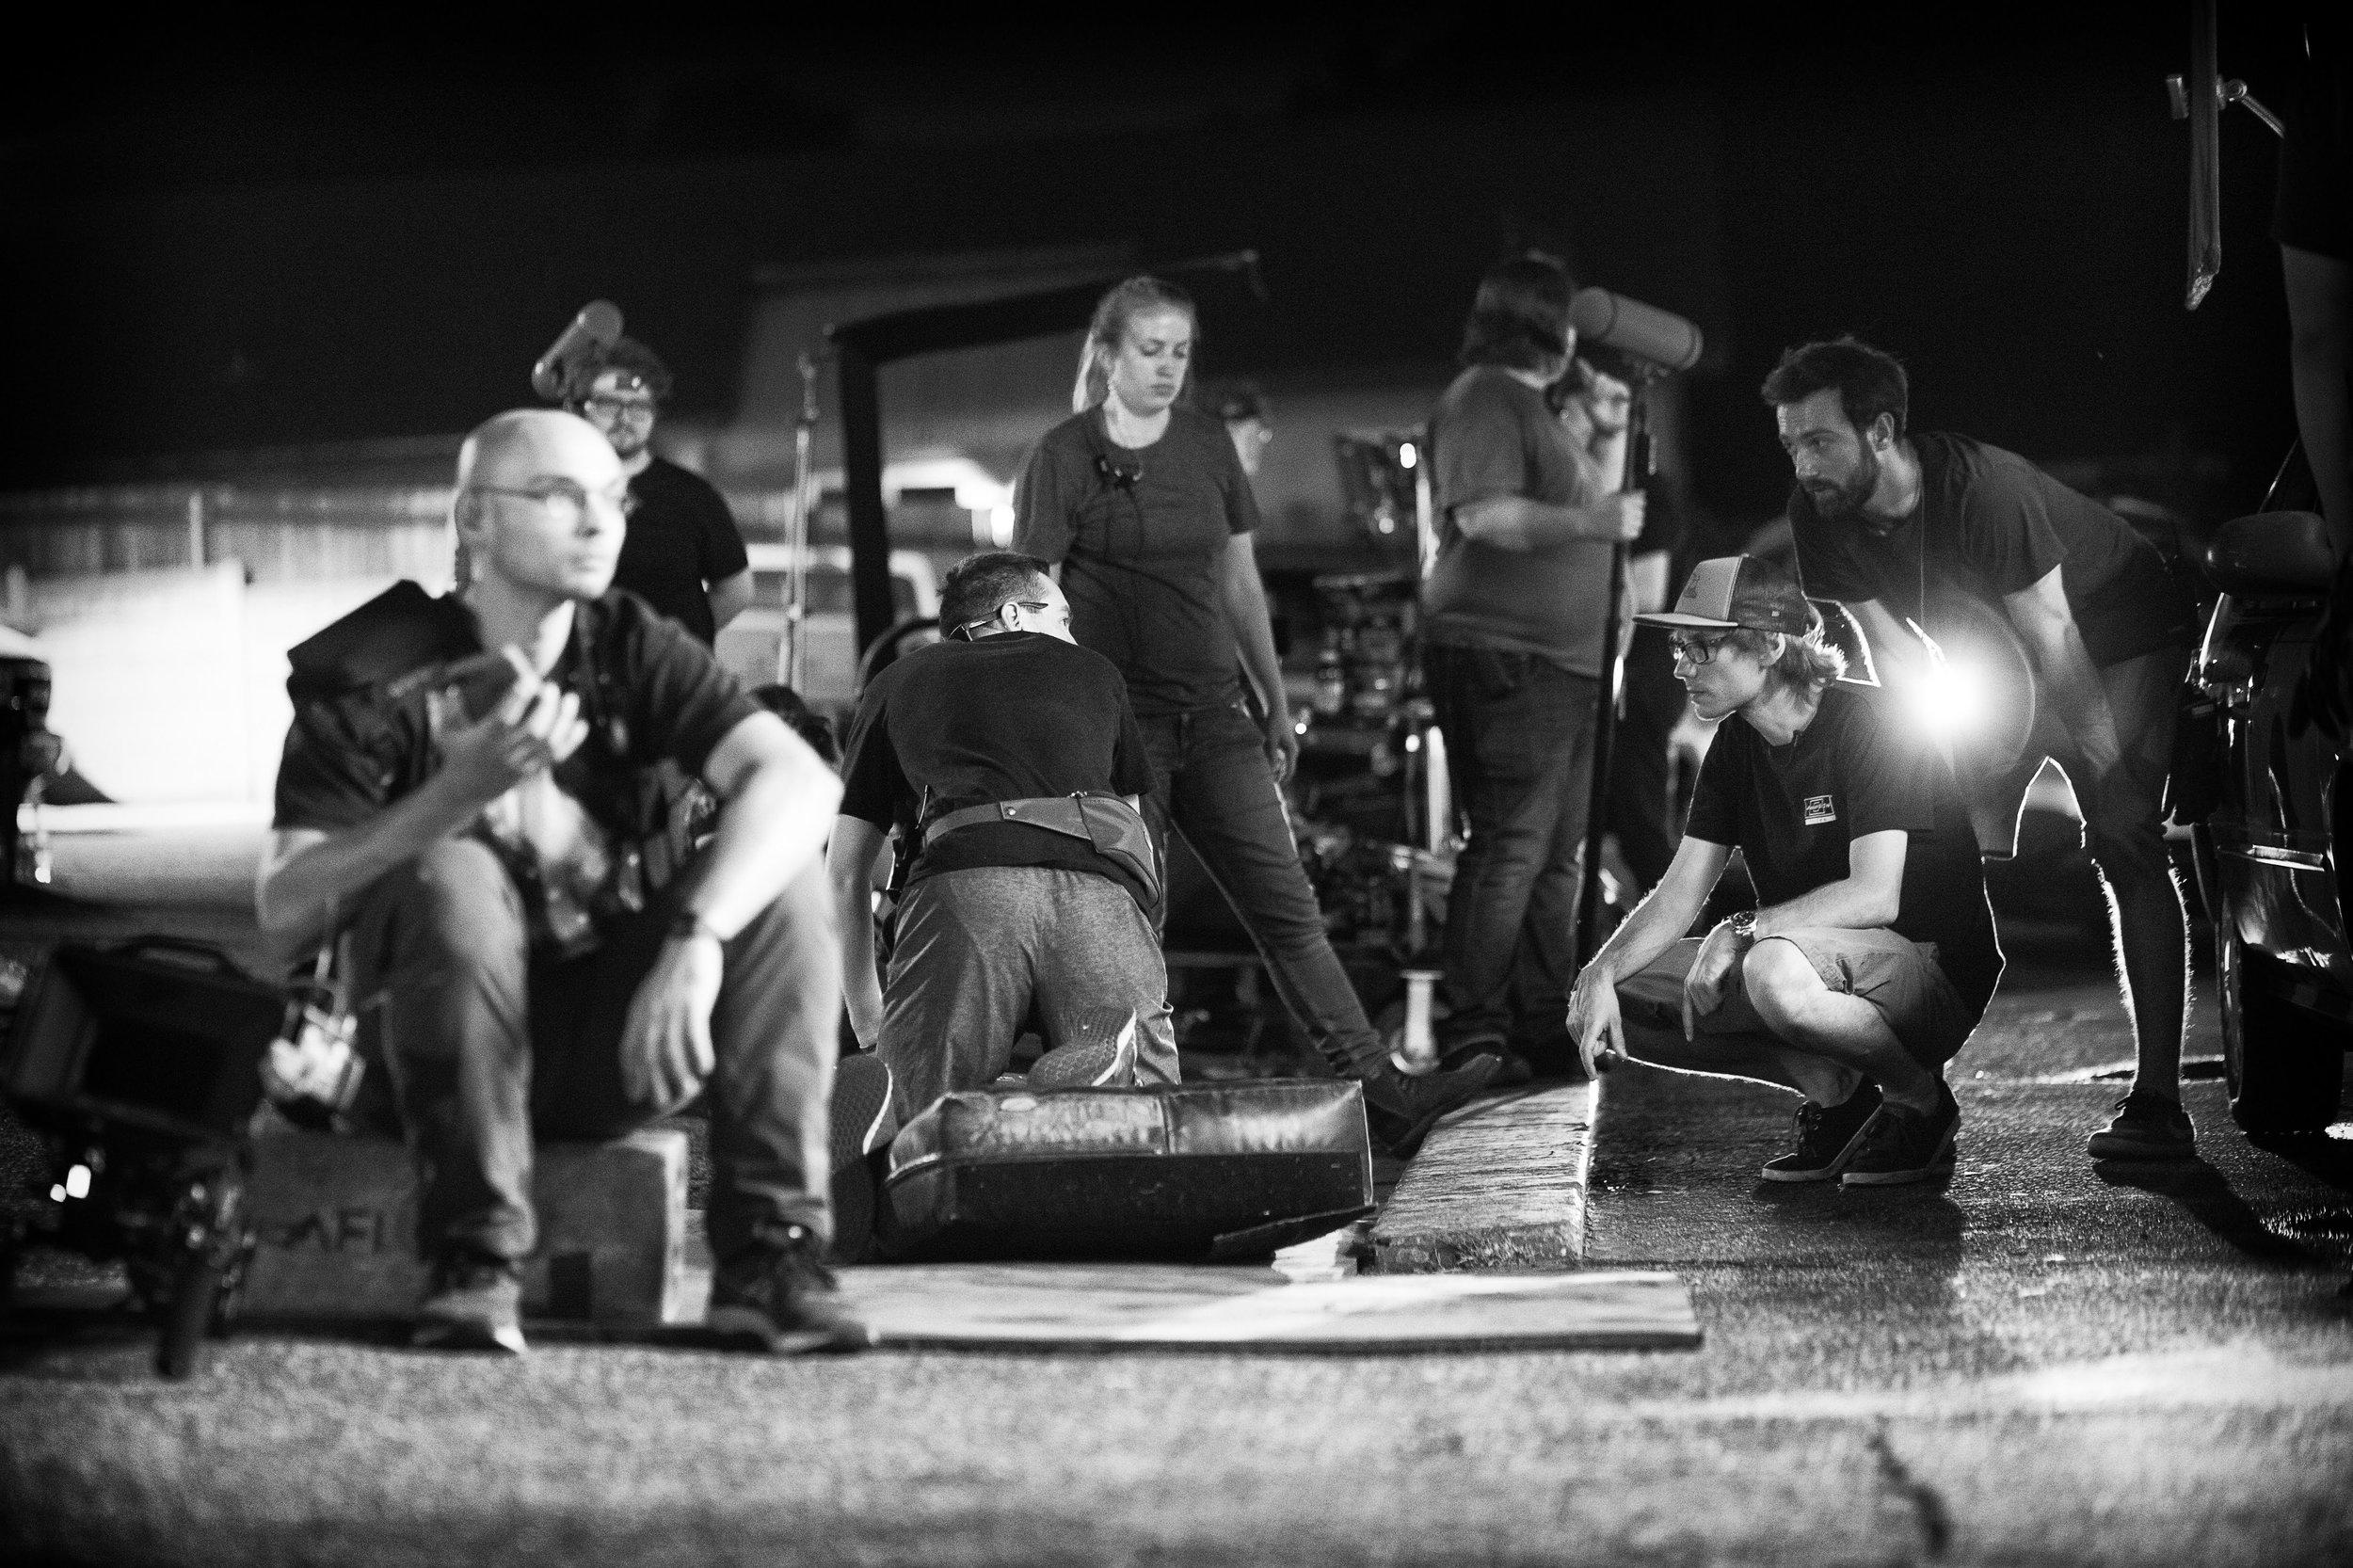 B CAM Operator  Marcin Banasiak  sets up a shot with Key Grip  Shannon Connally , Gaffer  Lukasz Dziedzic  and DP  Michal Wronski .